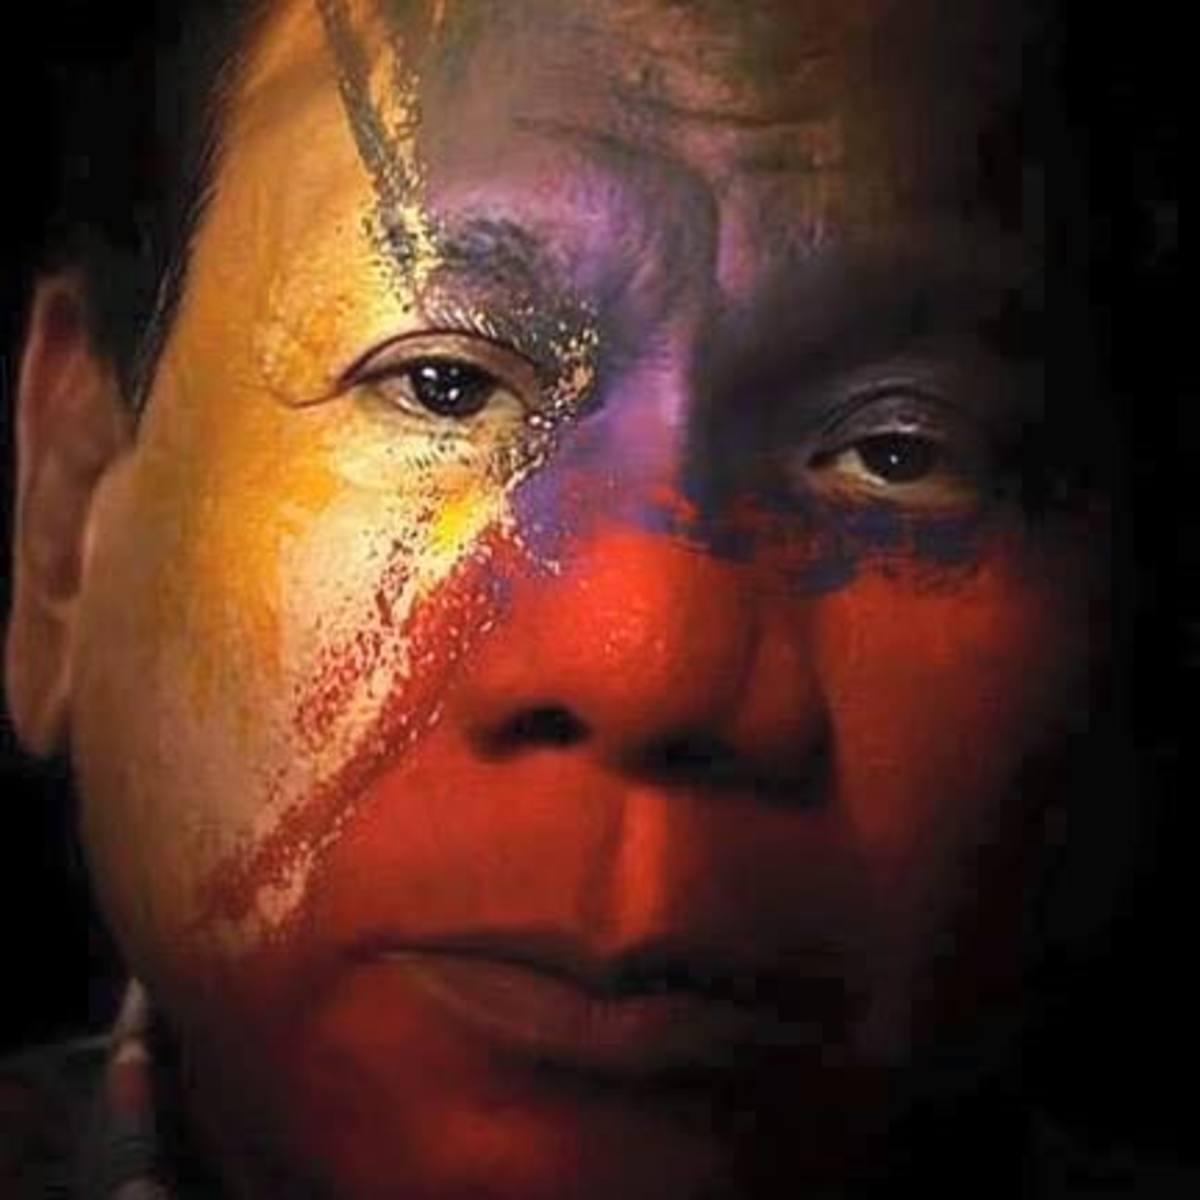 The Philippine Flag overlays President Duterte's face in this digital art presentation